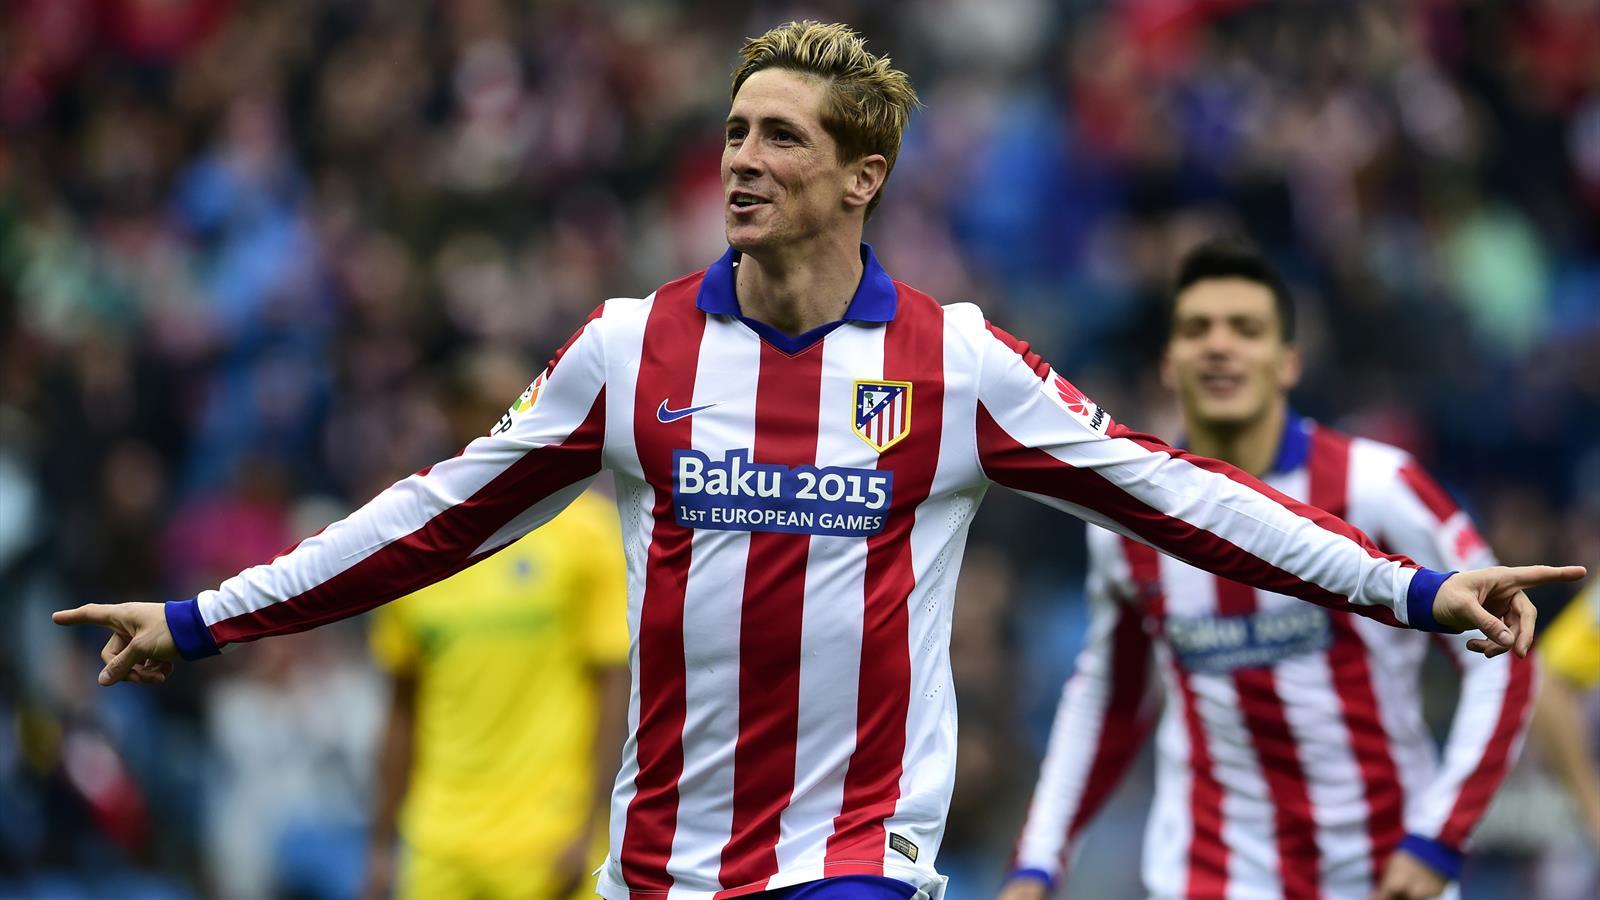 Atletico Madrid's forward Fernando Torres celebrates after scoring a goal during the Spanish league football match Club Atletico de Madrid vs Getafe